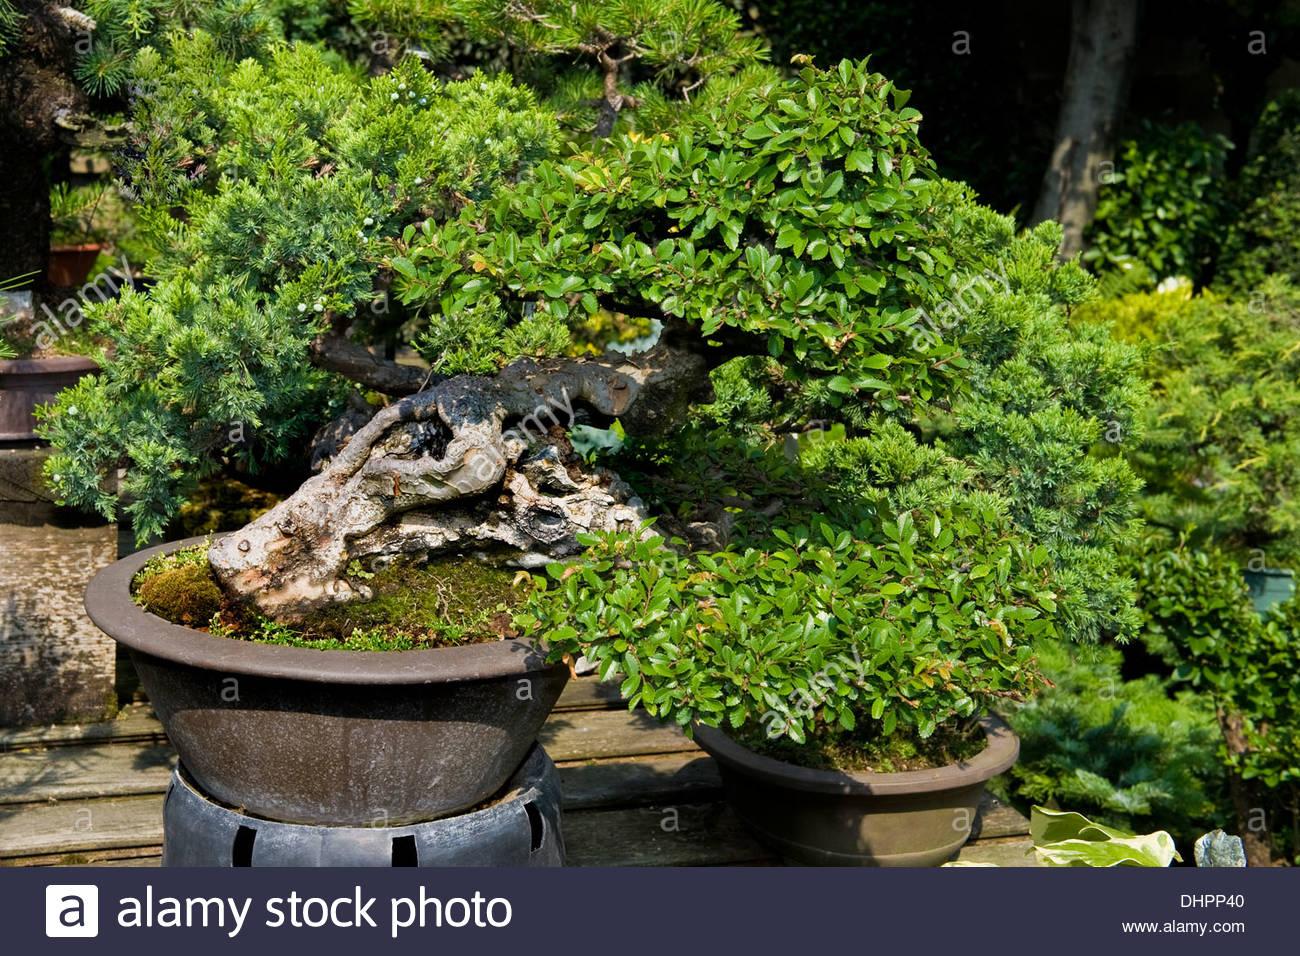 zelkova nire,albonsai,milan,italy - Stock Image